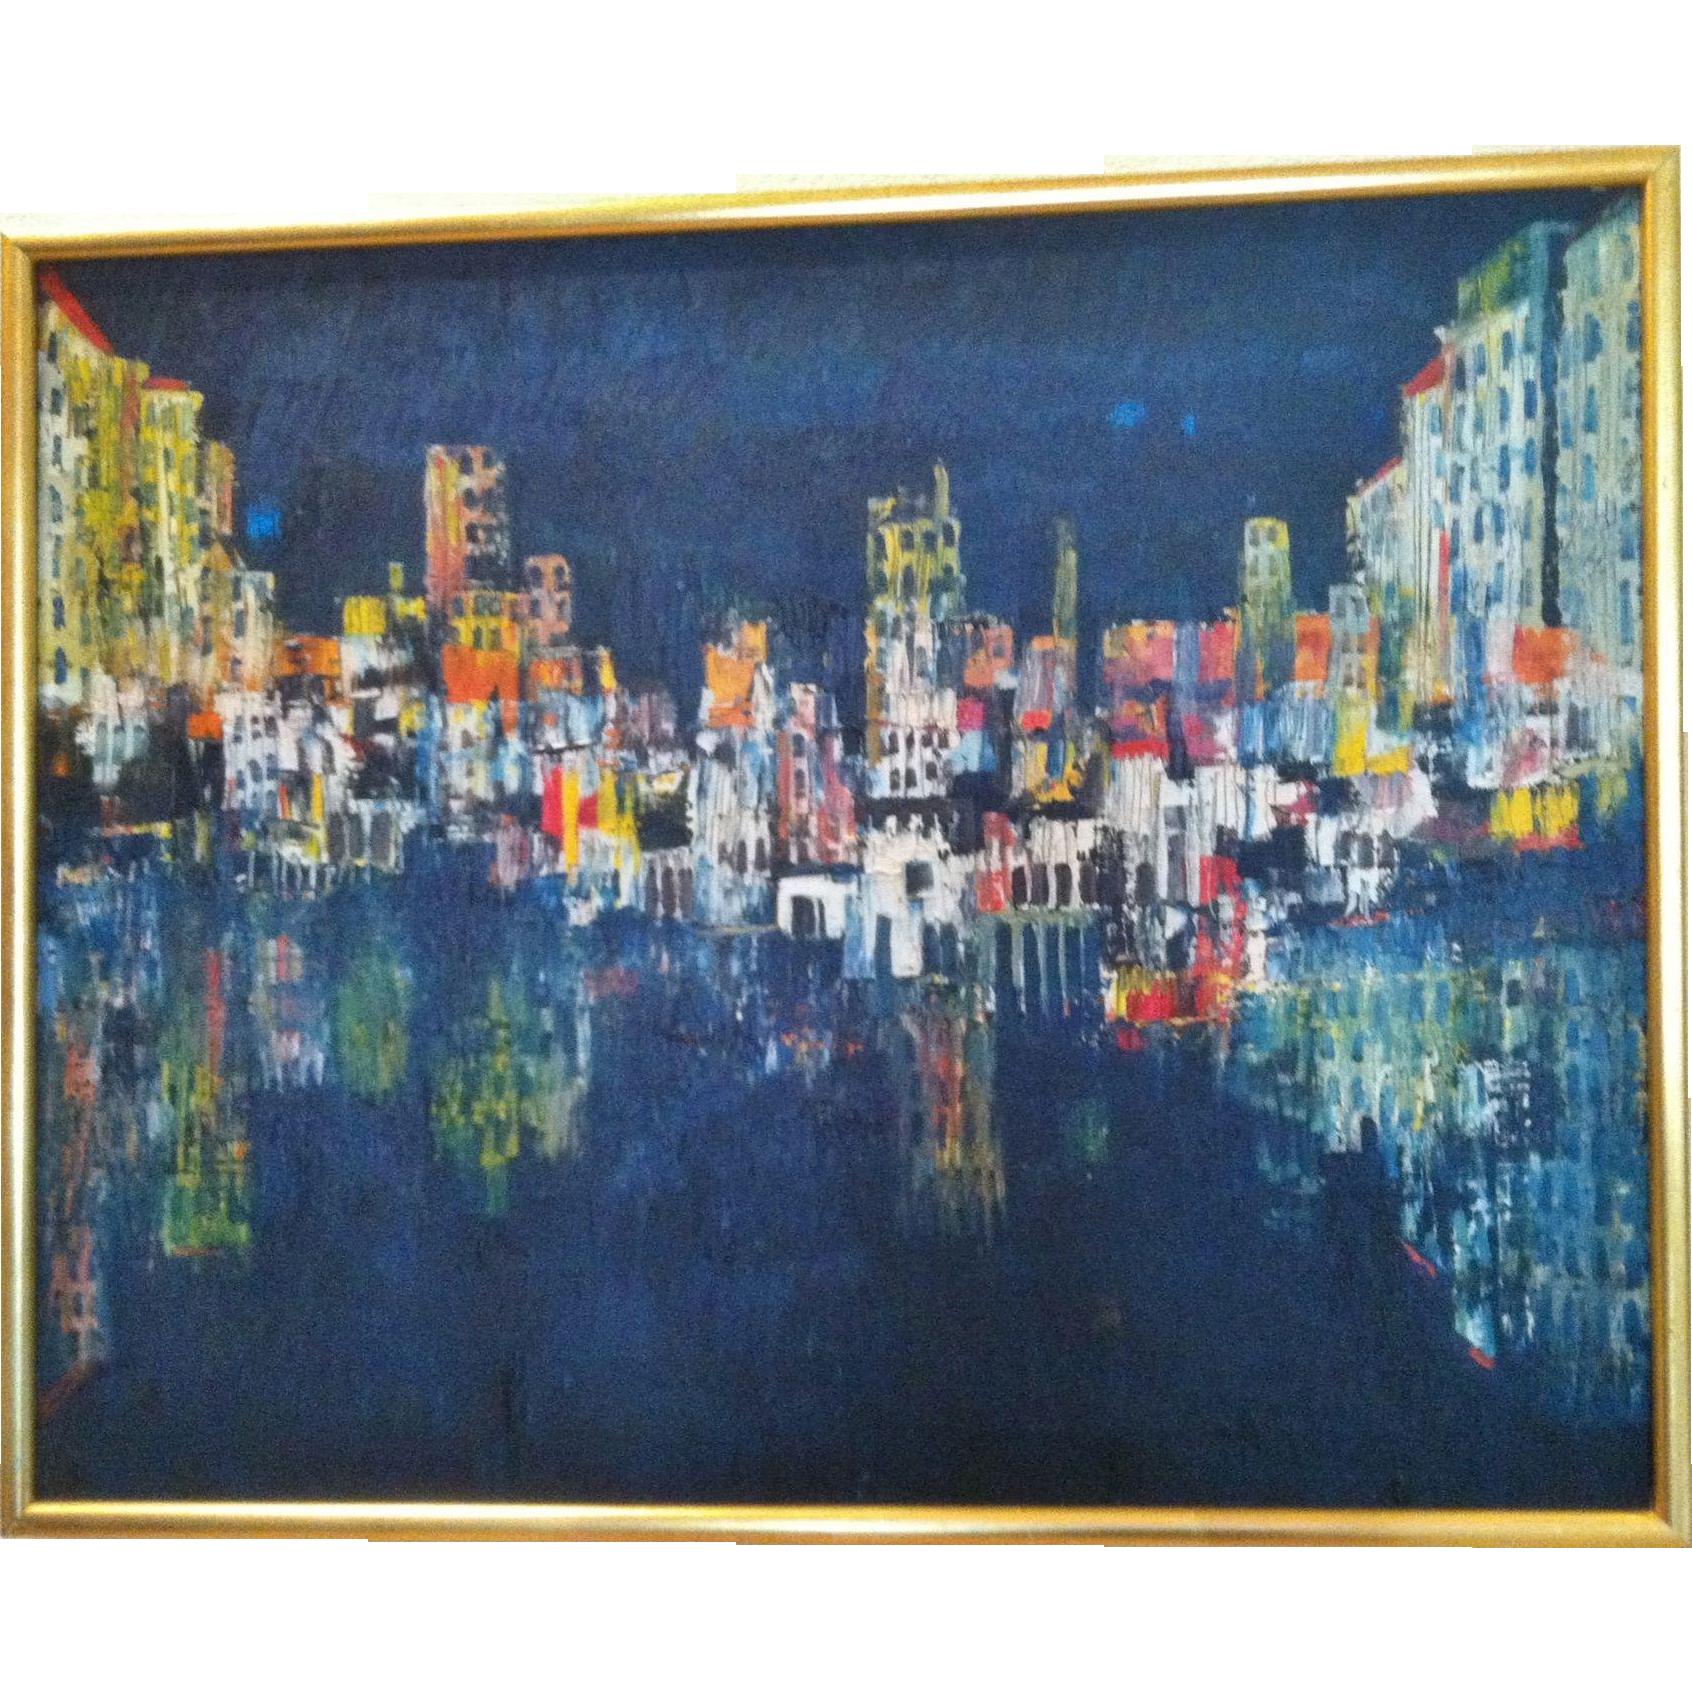 "Modernist Painting,""Mediterranean Harbor,Ladislas Kardos, 1966"